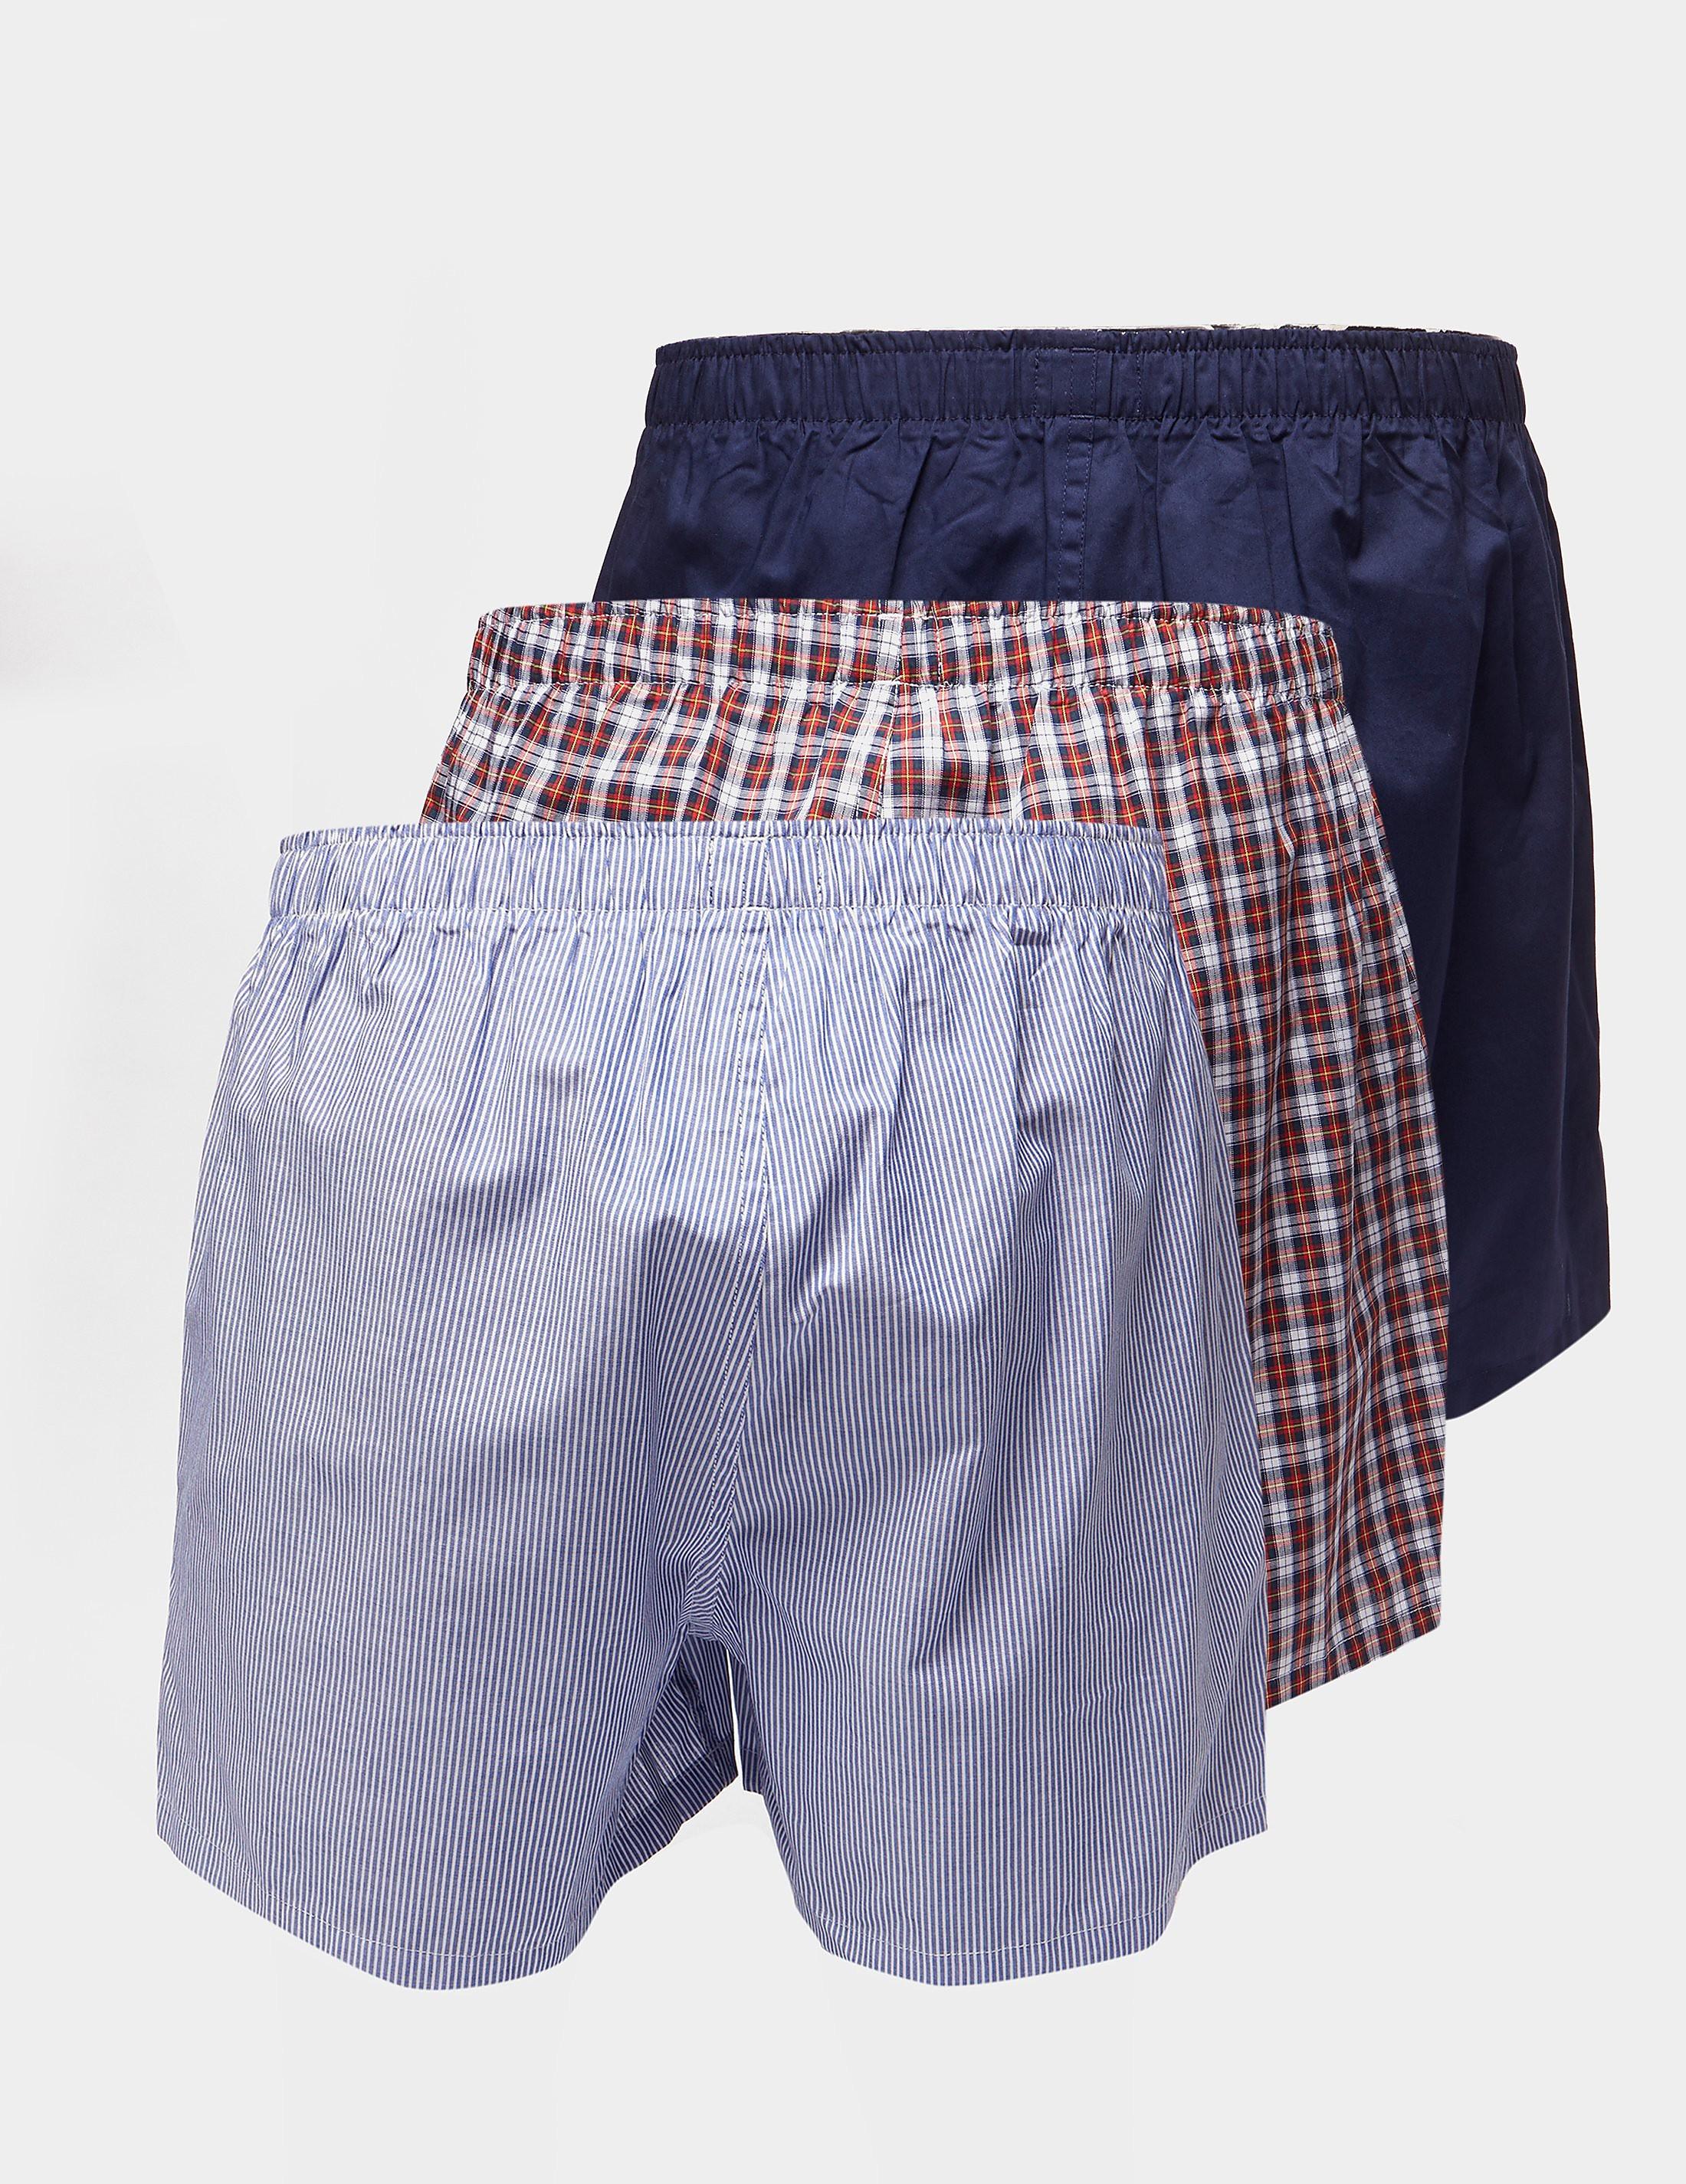 Polo Ralph Lauren 3-Pack Woven Boxer Shorts